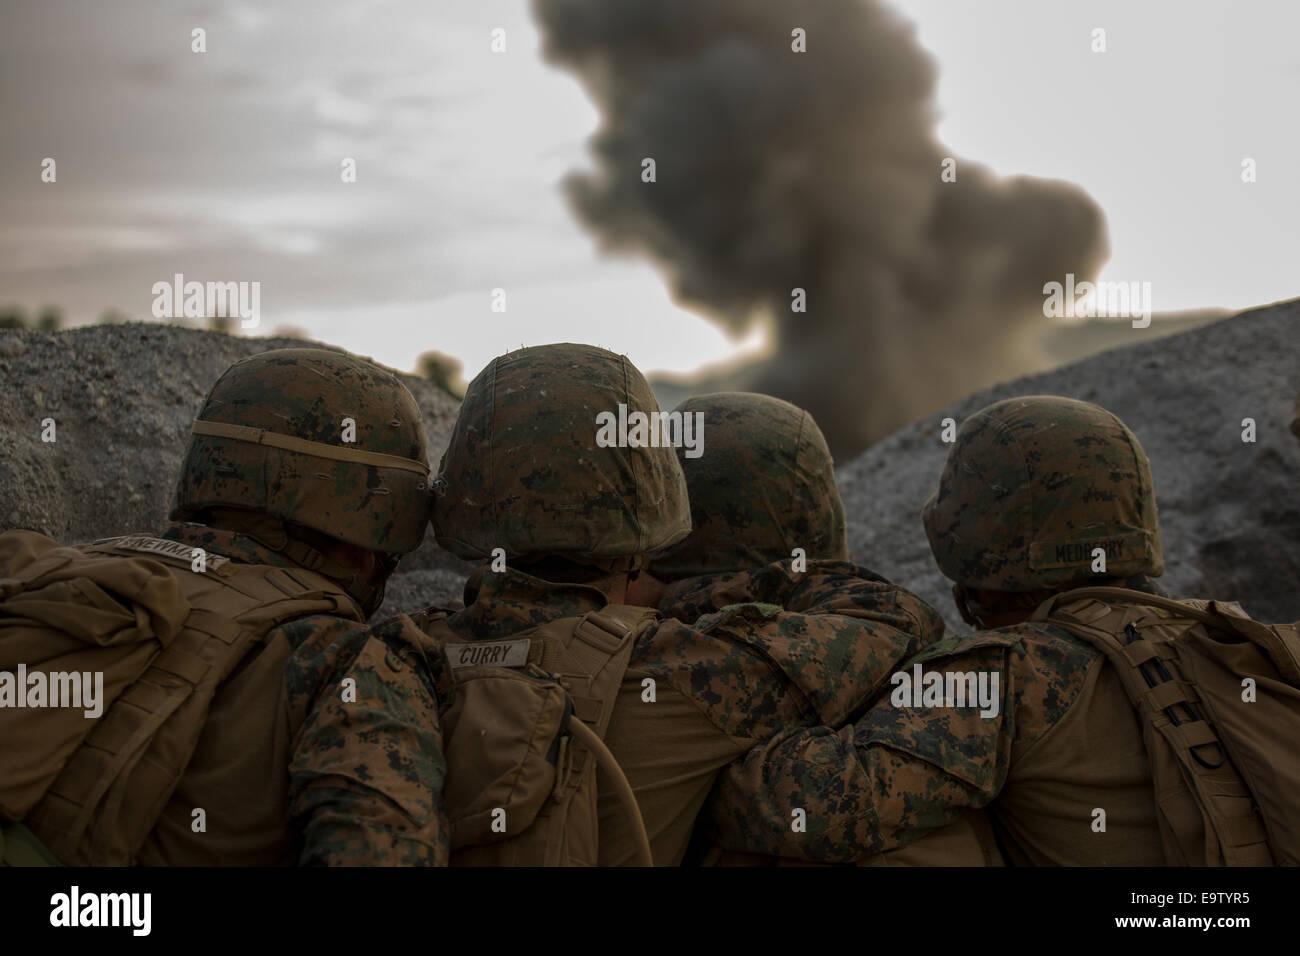 U.S. Marines with Battalion Landing Team, 3rd Battalion, 5th Marine Regiment, 31st Marine Expeditionary Unit observe - Stock Image